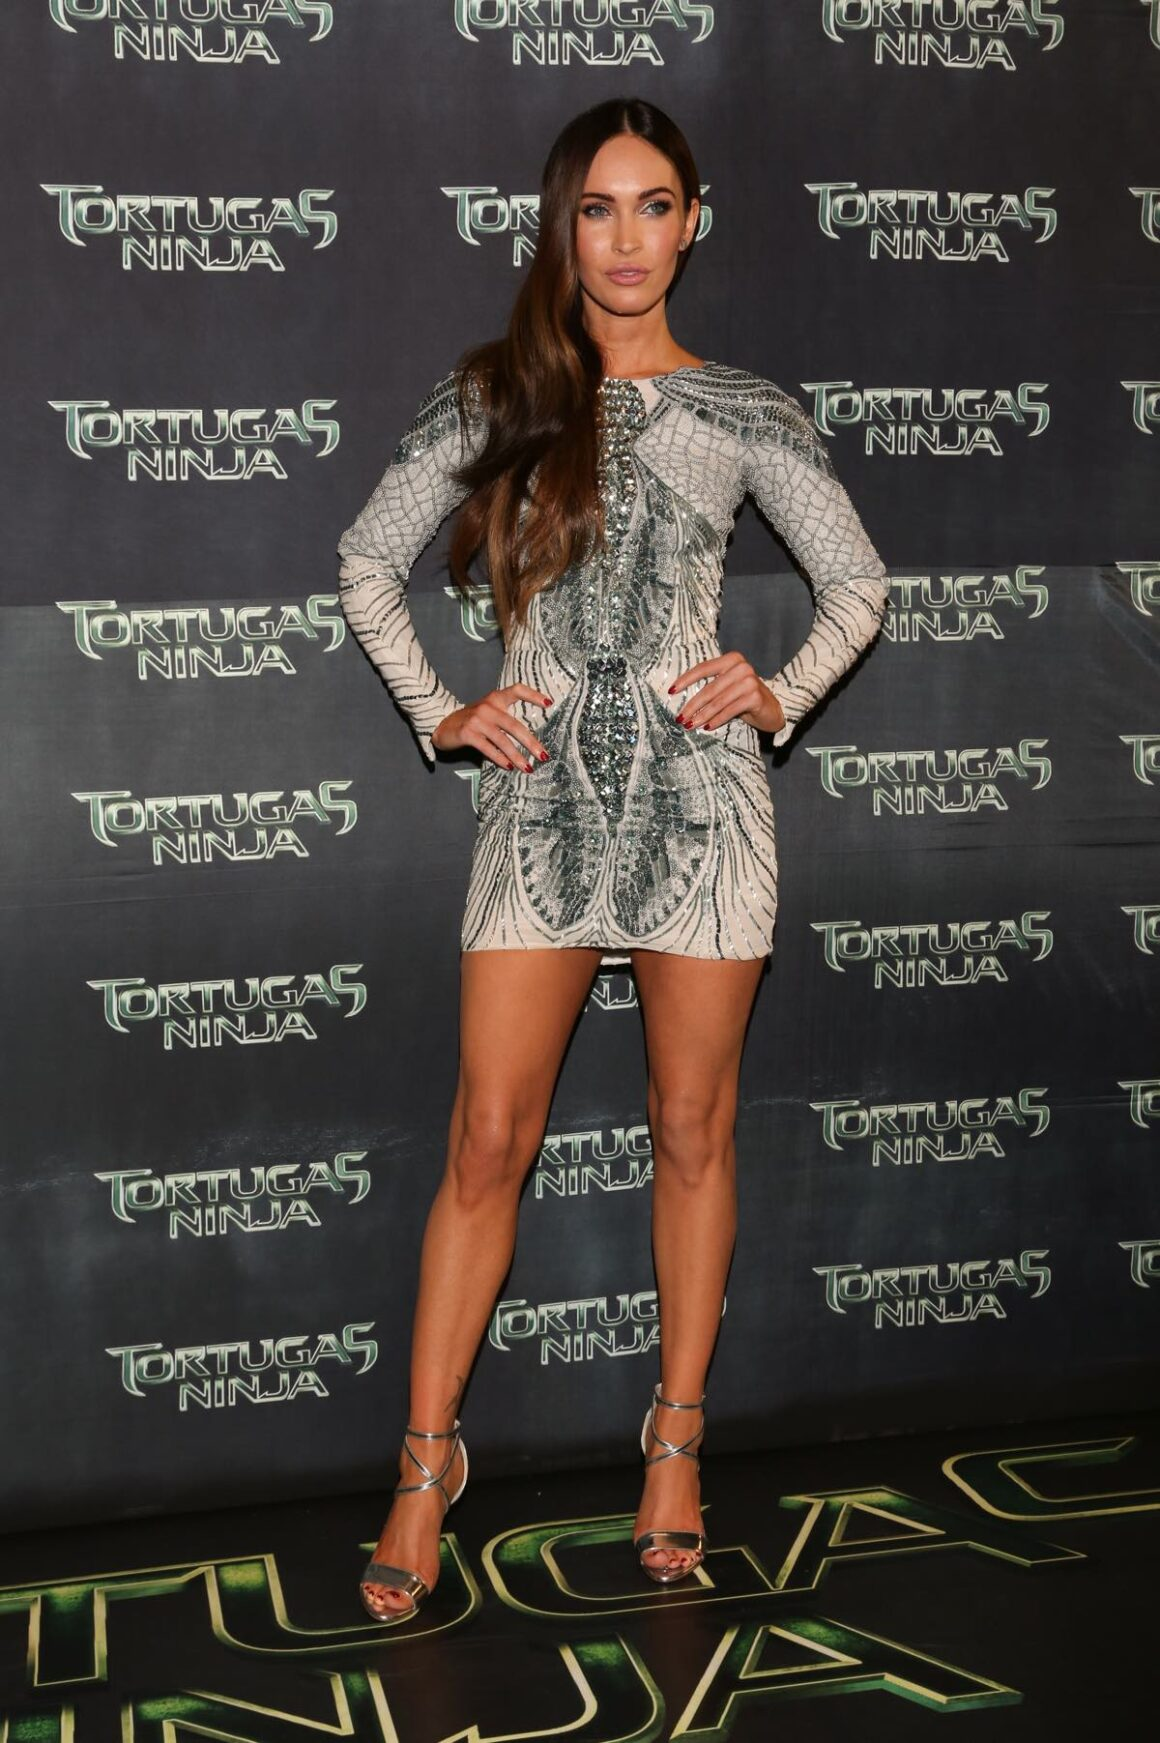 Megan Fox attends Teenage Mutant Ninja Turtles Premiere in Mexico